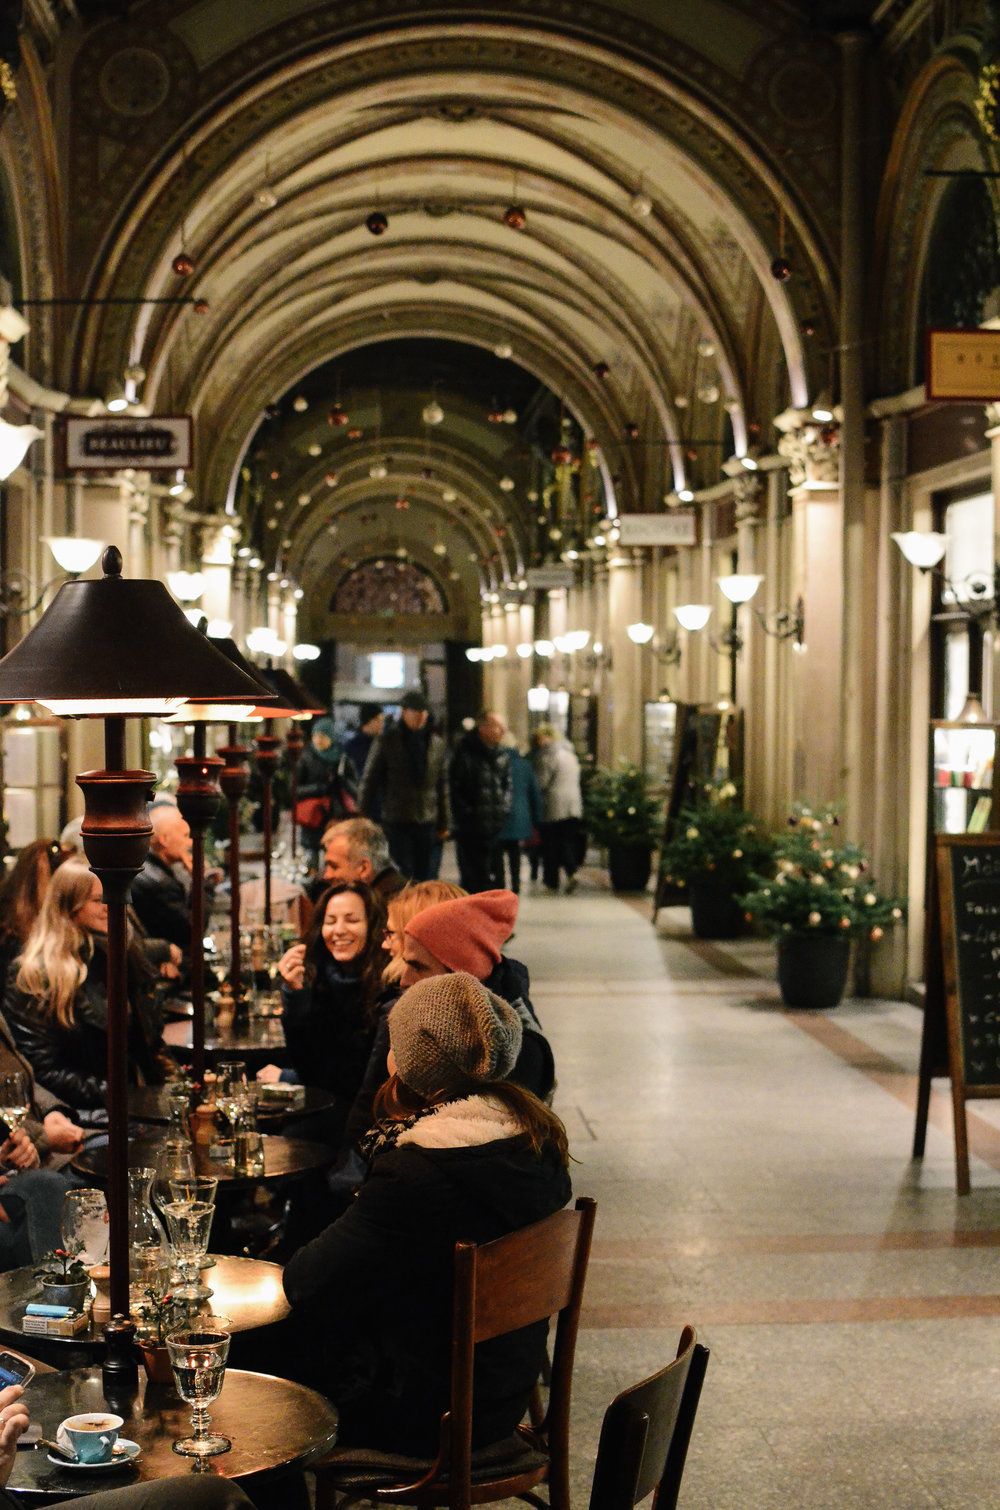 european-christmas-market-travel-guide-lifeonpine_DSC_1506.jpg